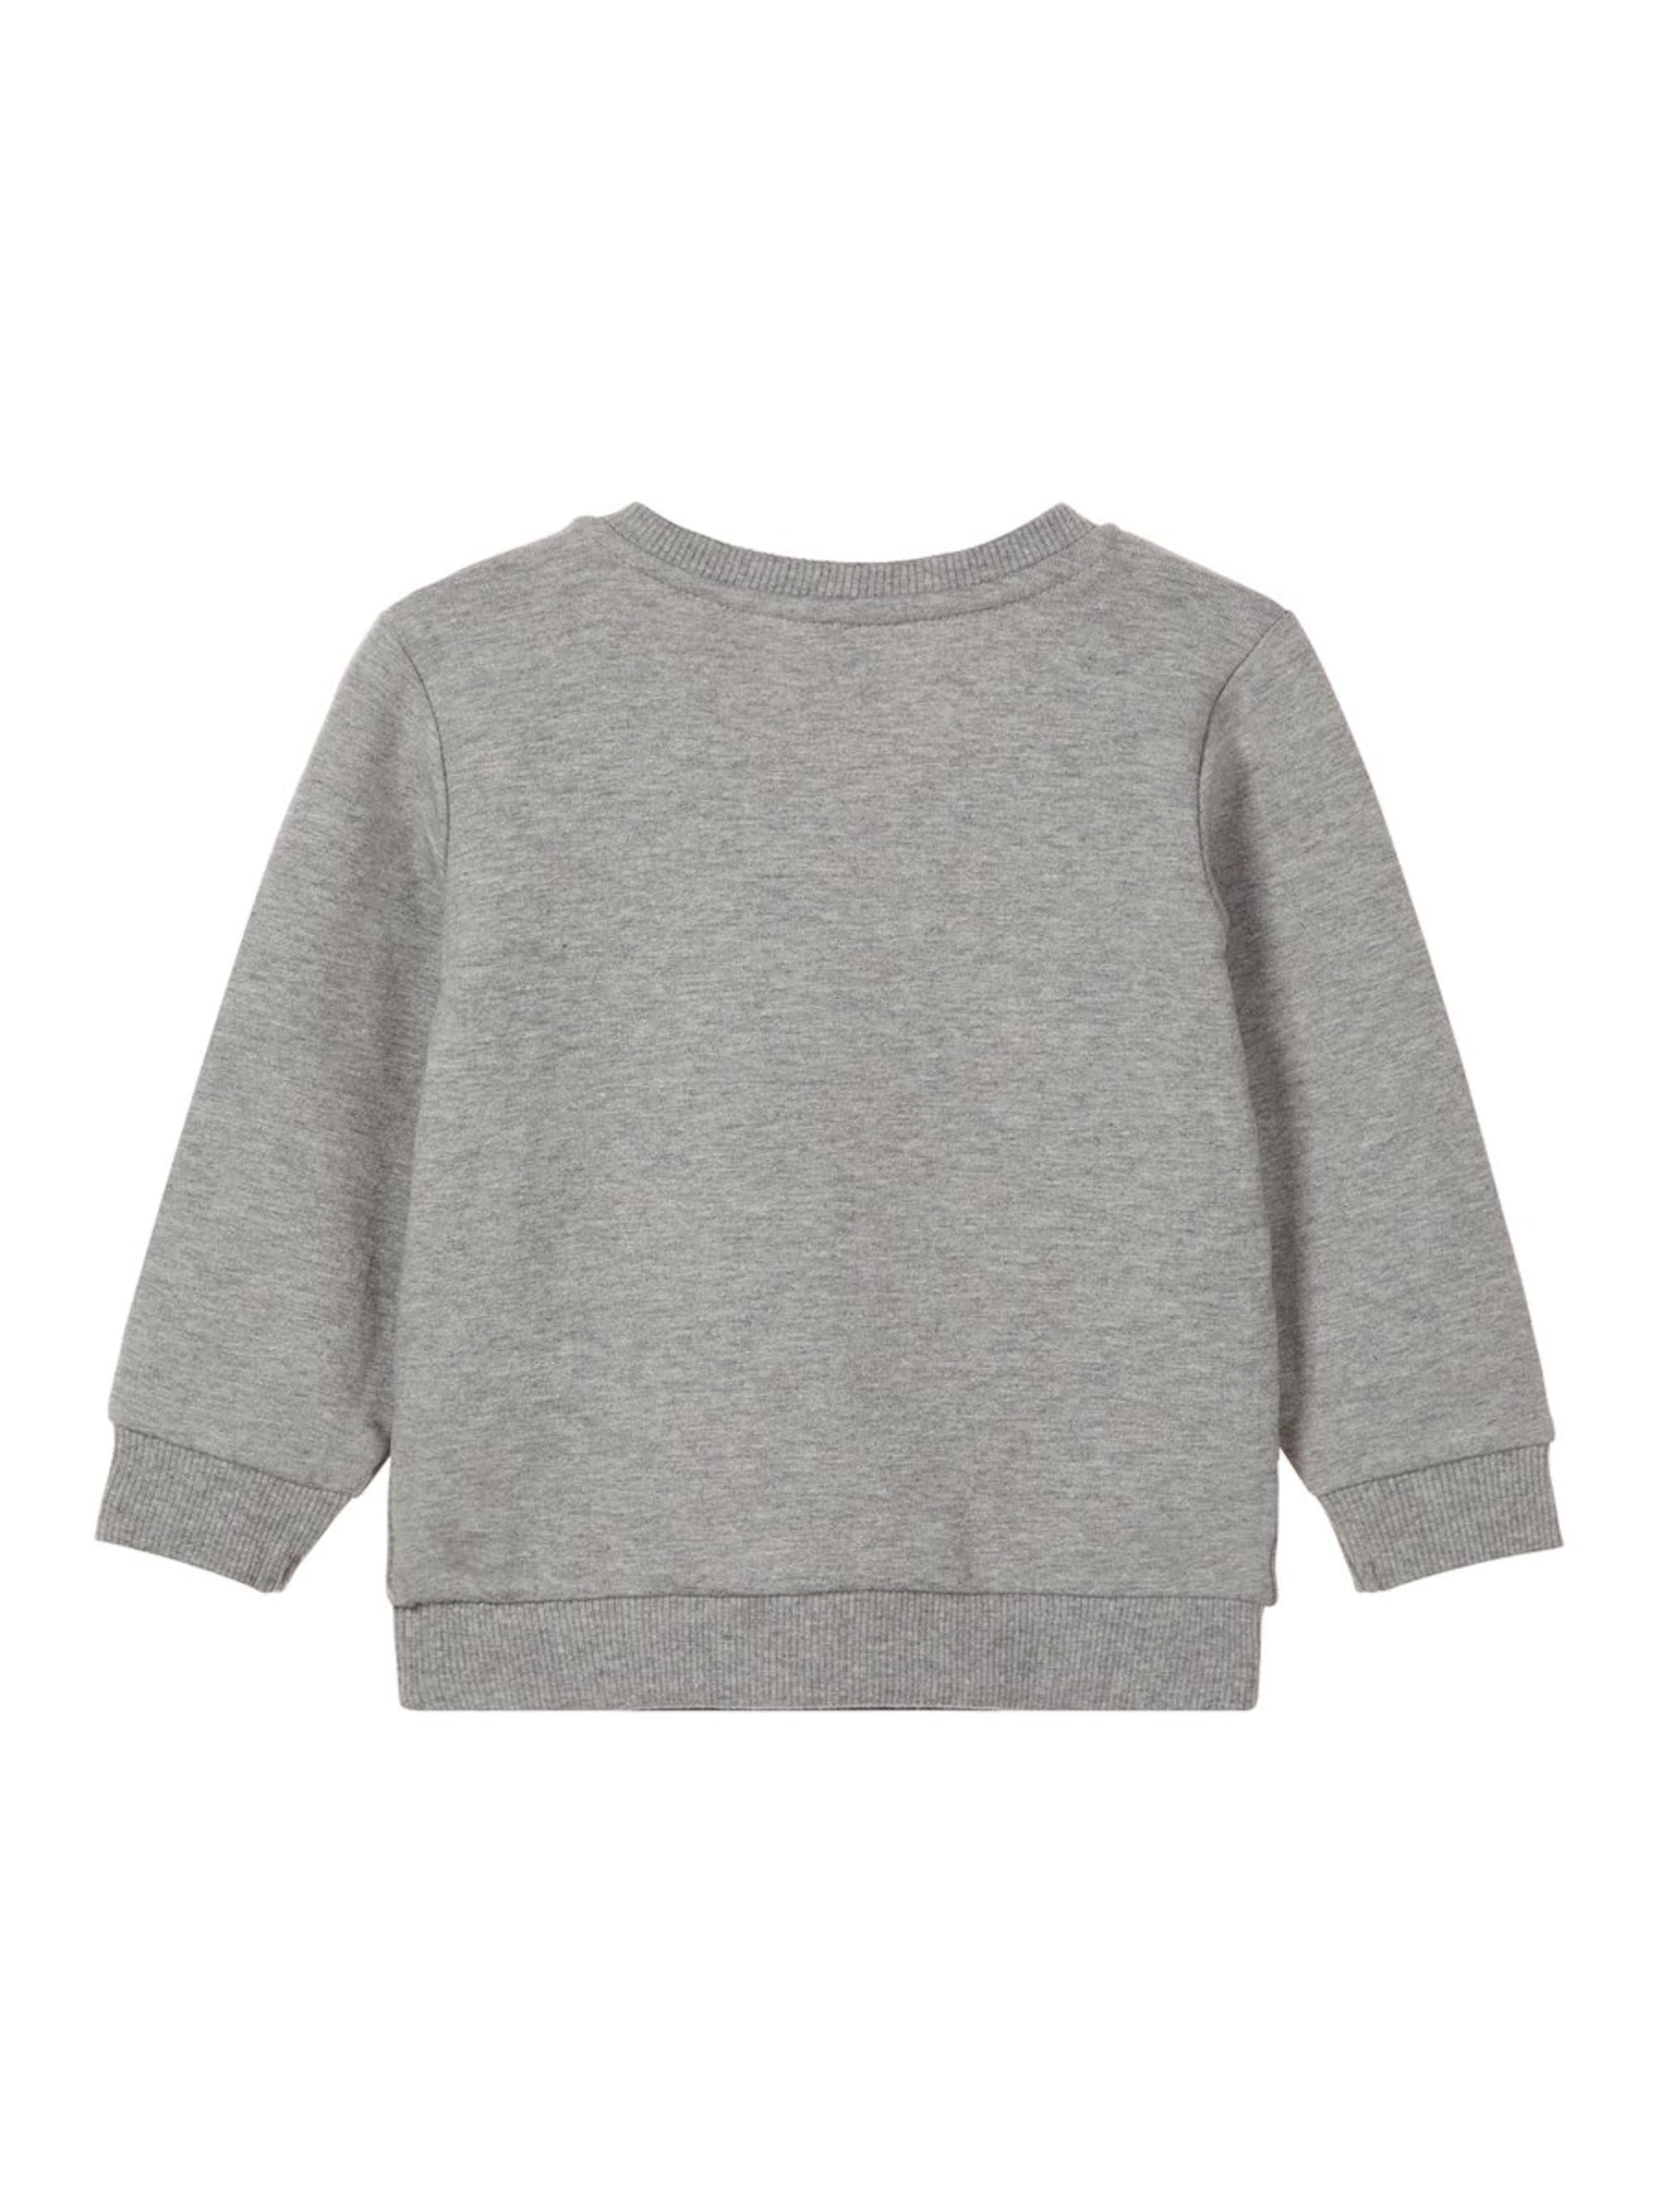 Sweatshirt 'Teddybär'